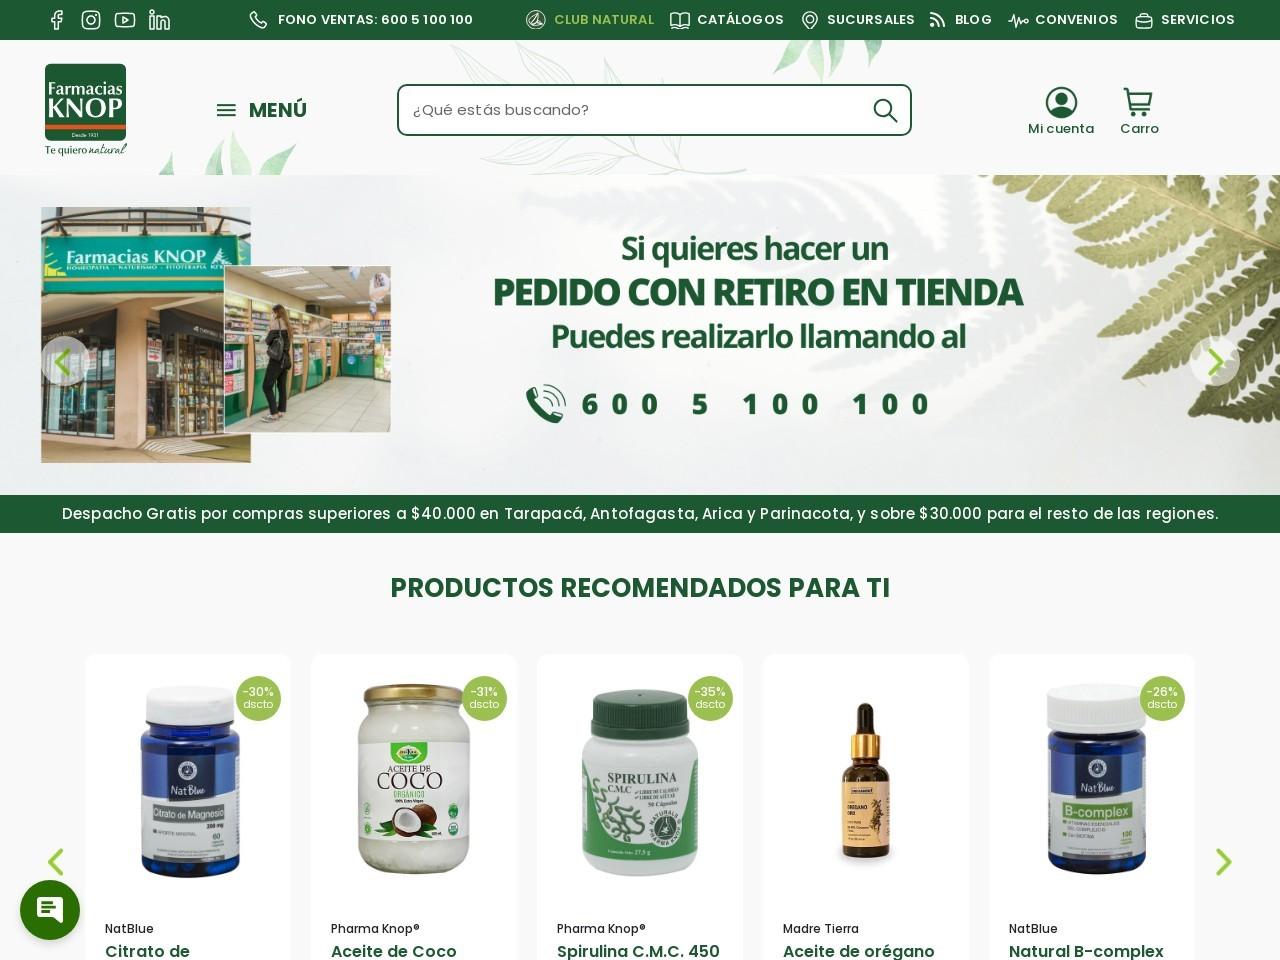 Farmacias Knop